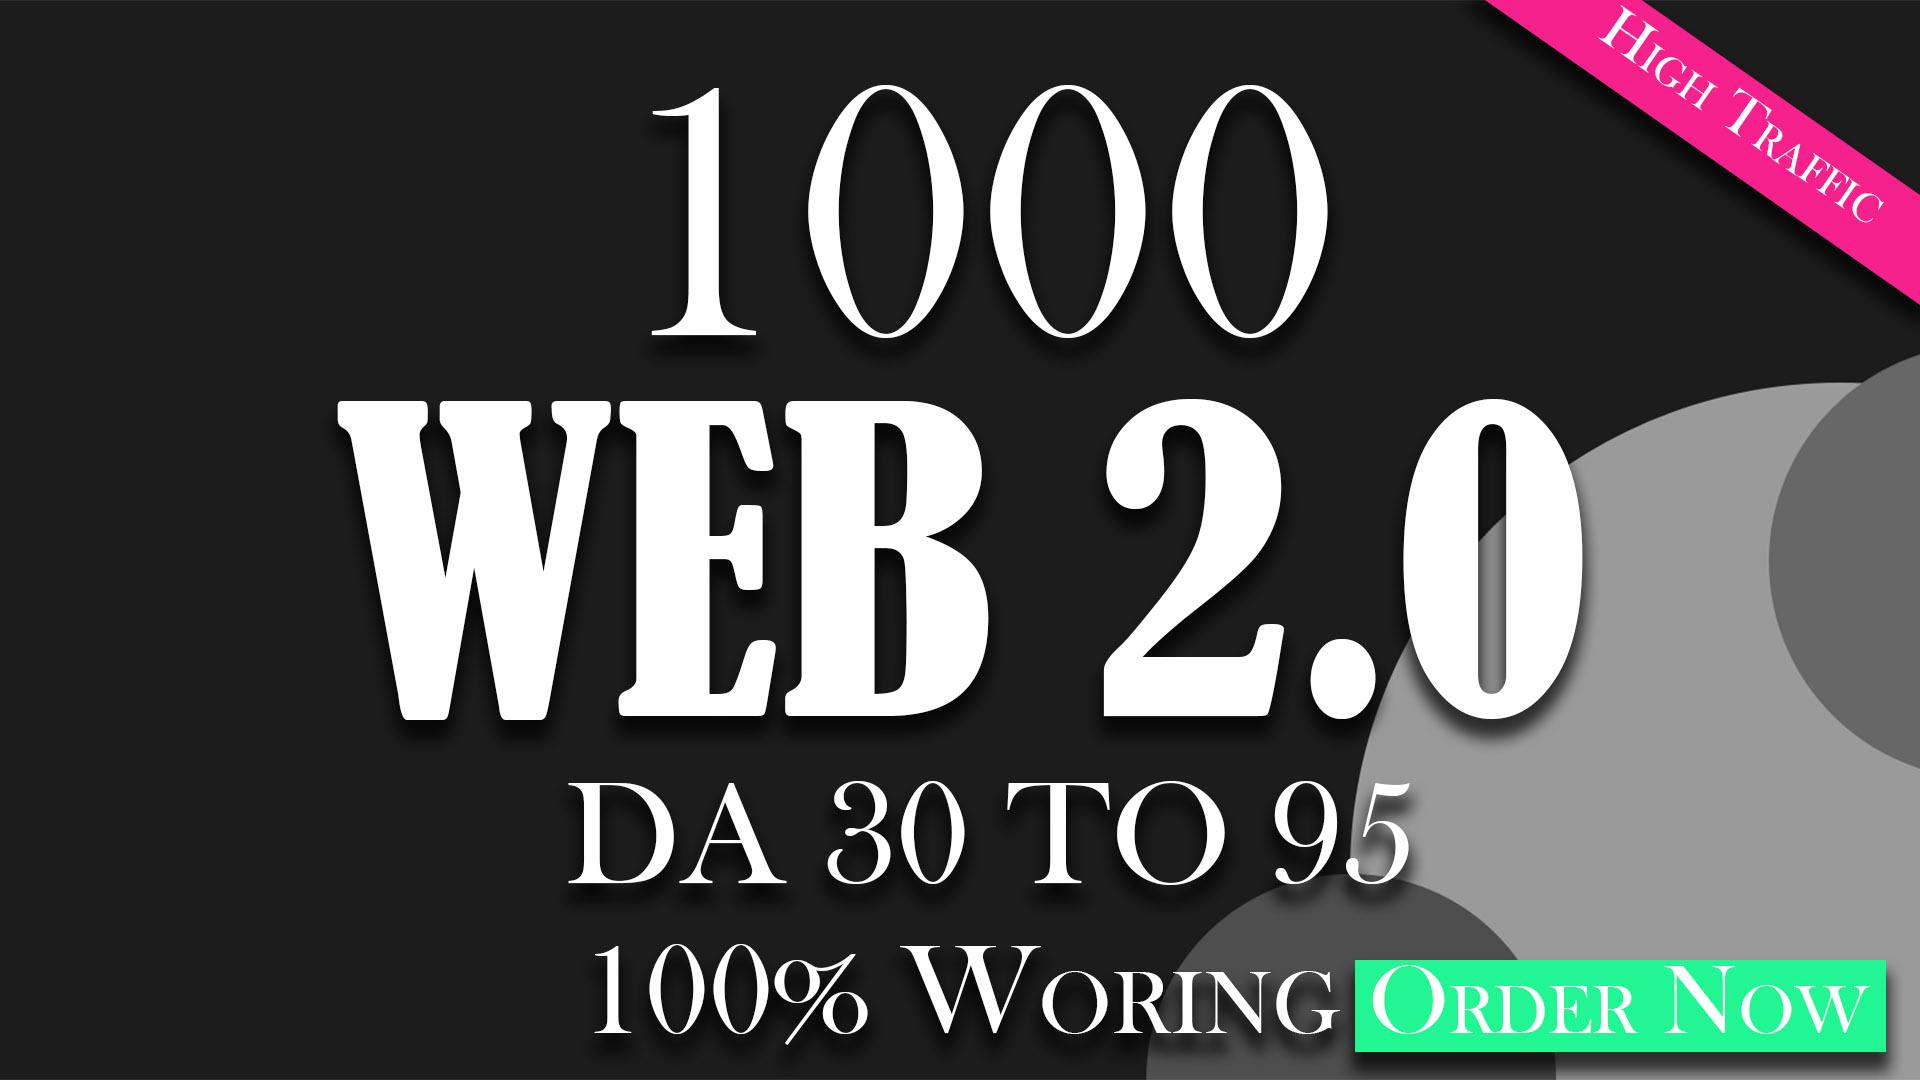 Get Web 2.0 High Quality Links